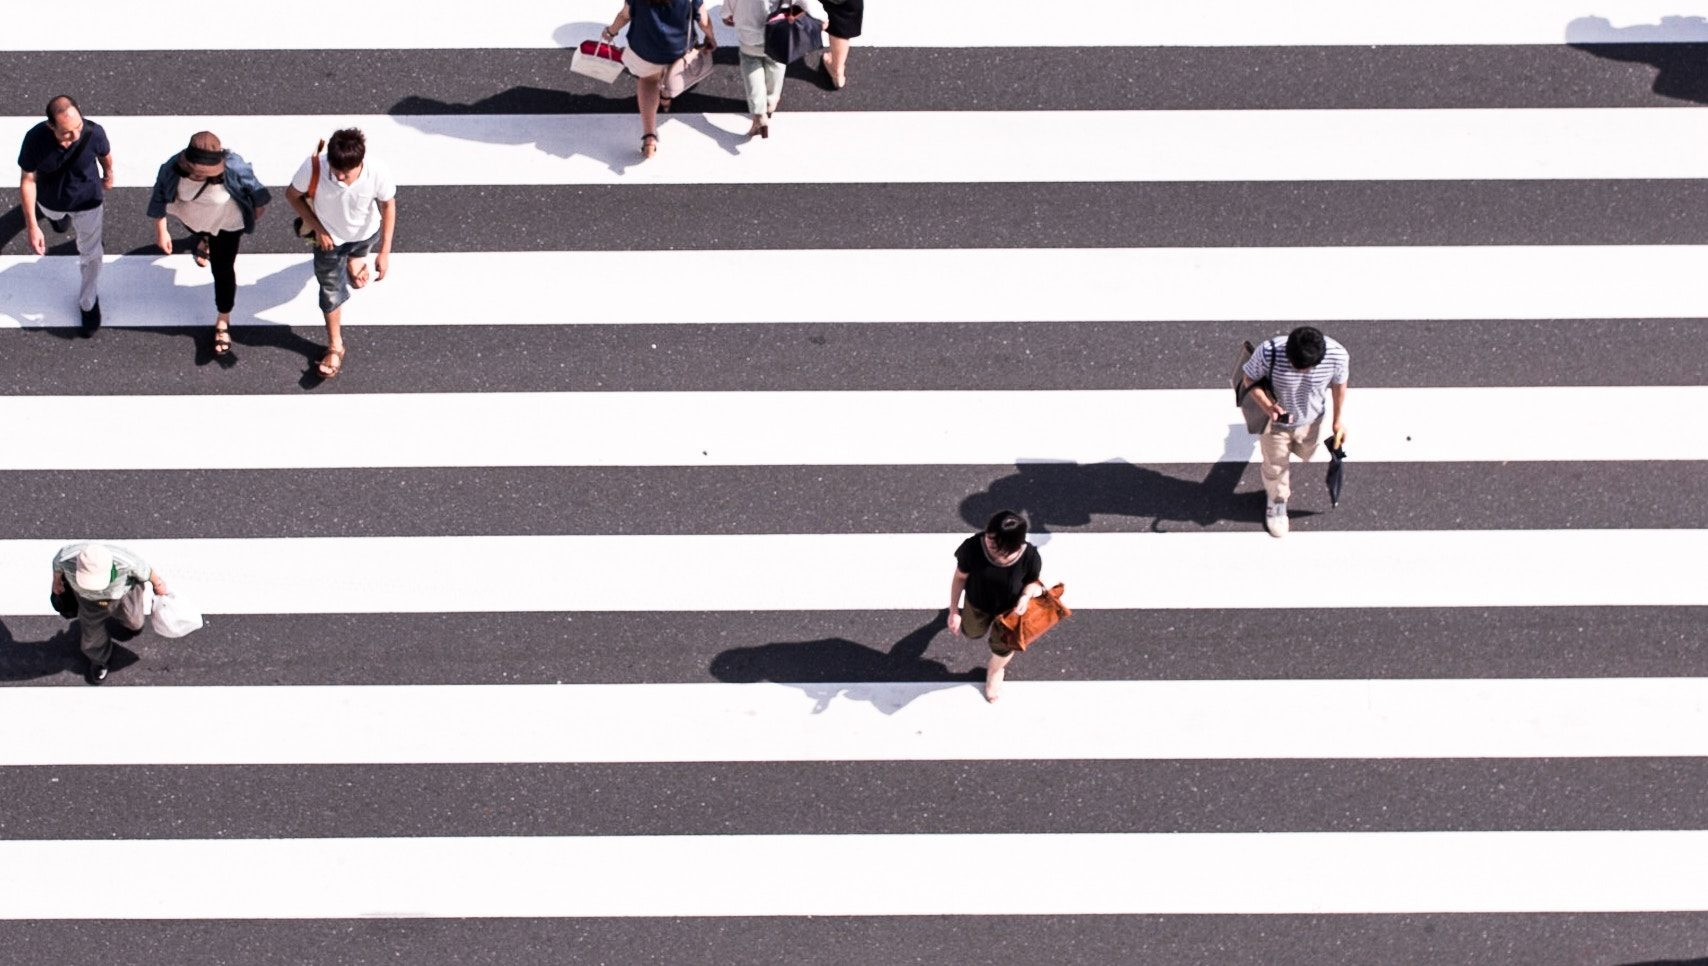 横断歩道の写真